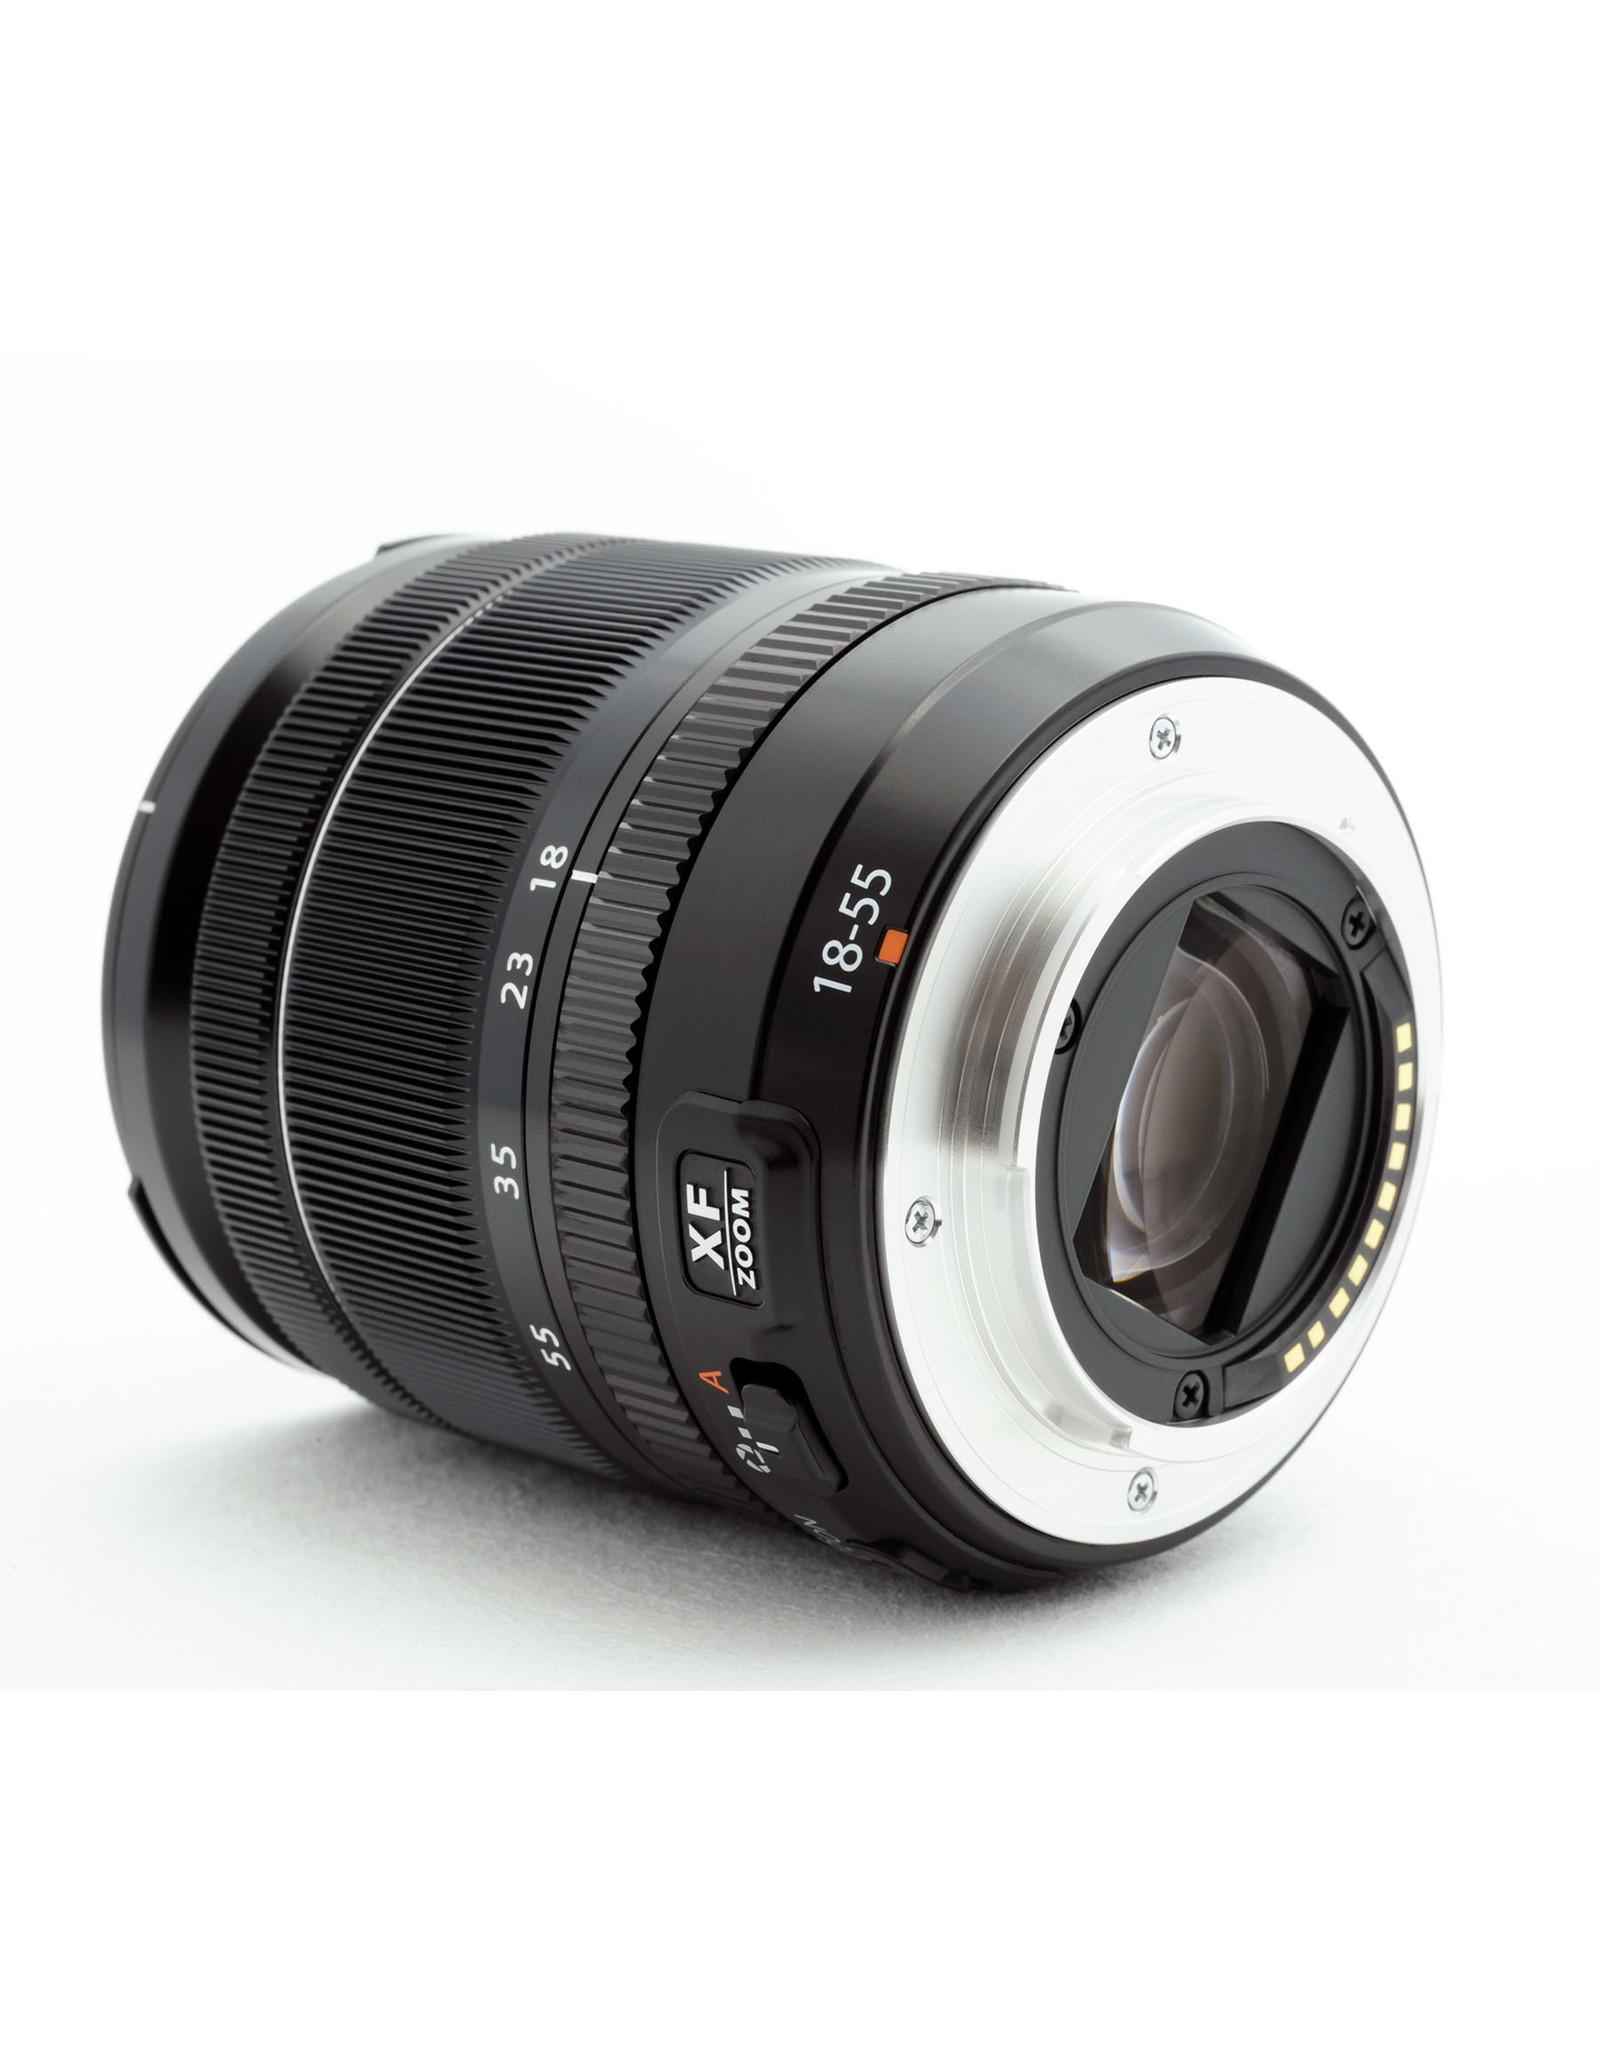 Fujifilm Fuji XF18-55mm f2.8-4 R LM OIS 16276479